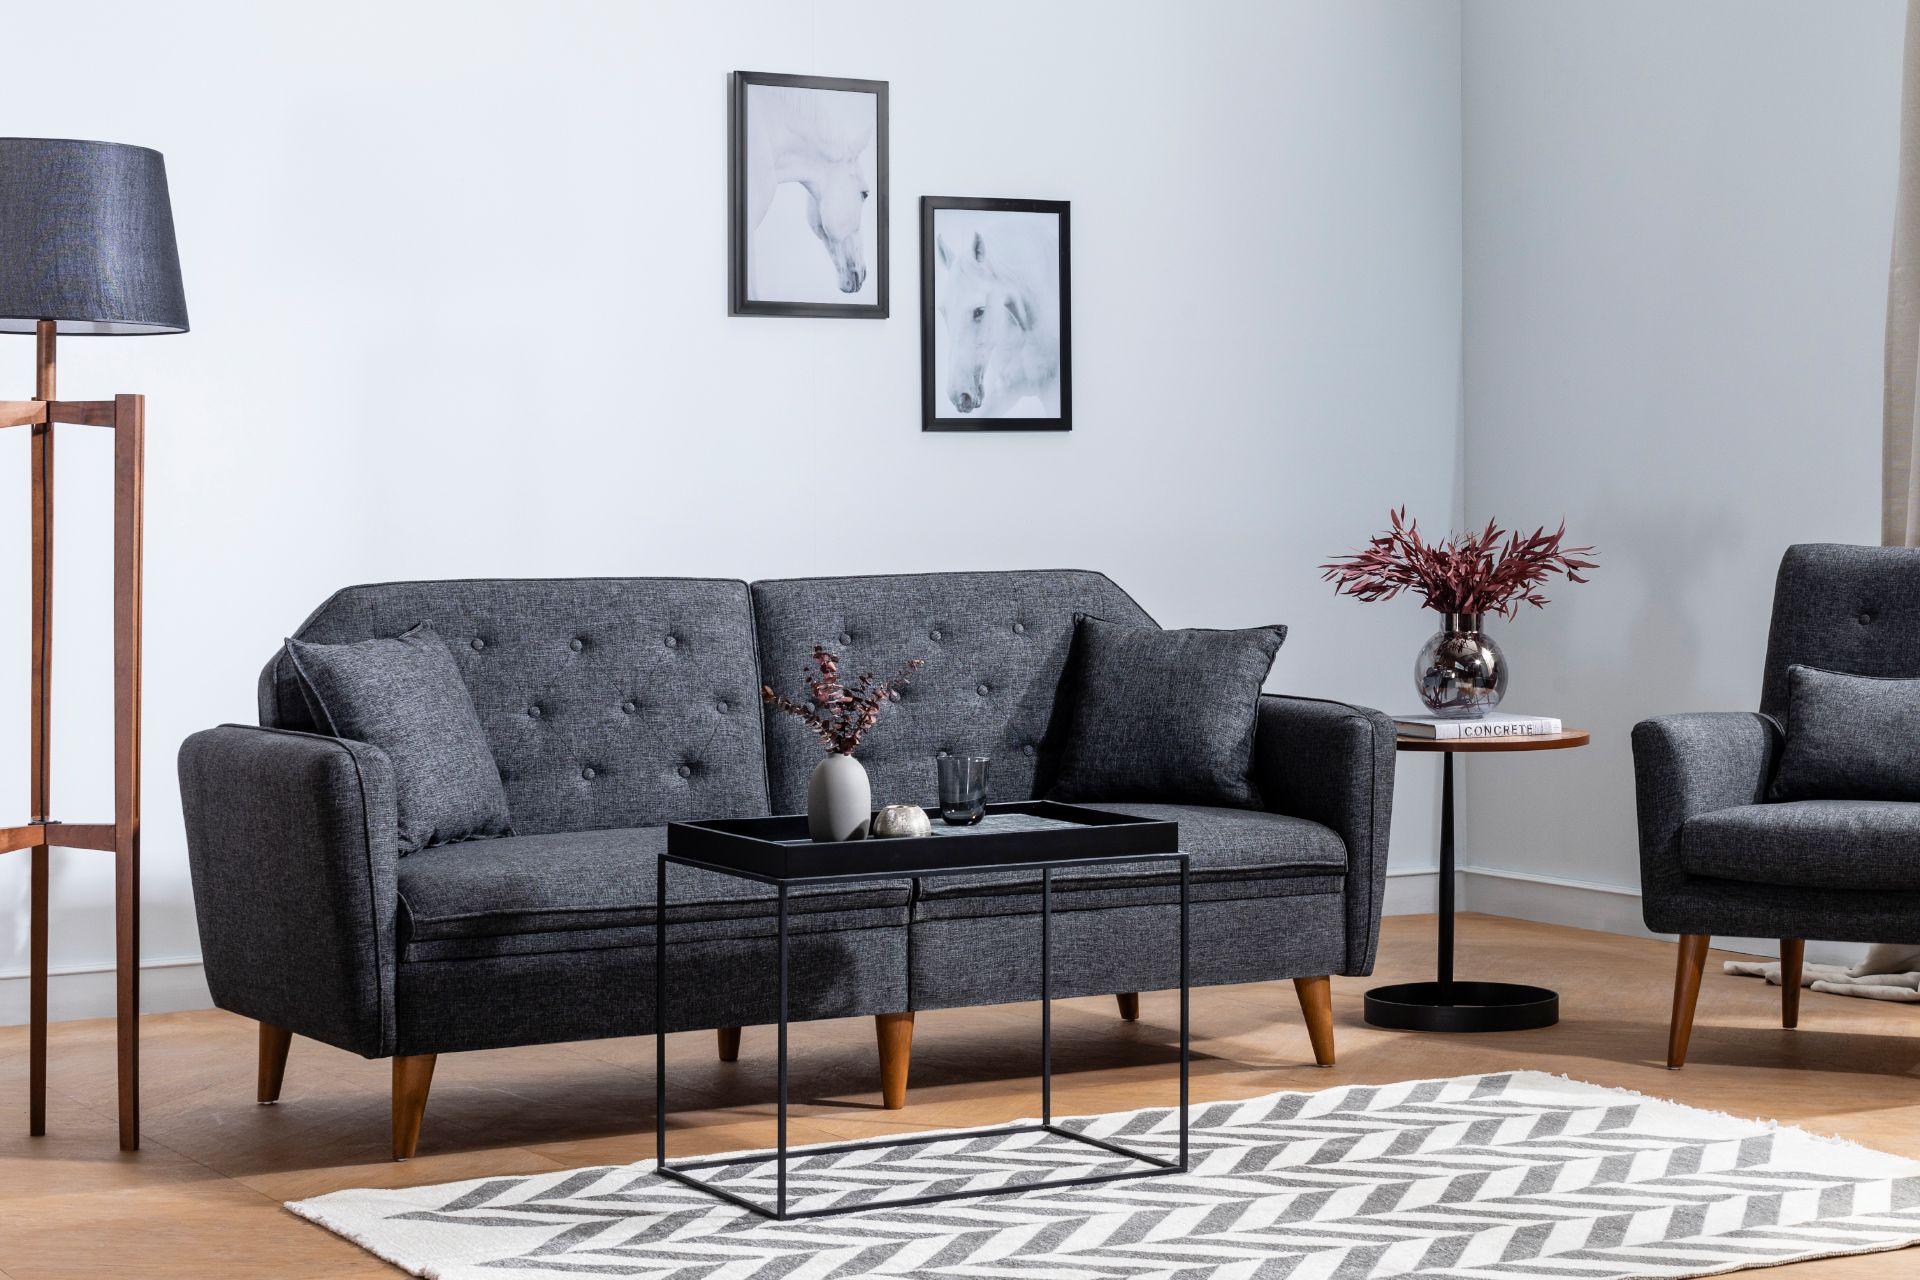 Terra Three Seater Sofa Bed, Anthracite Grey